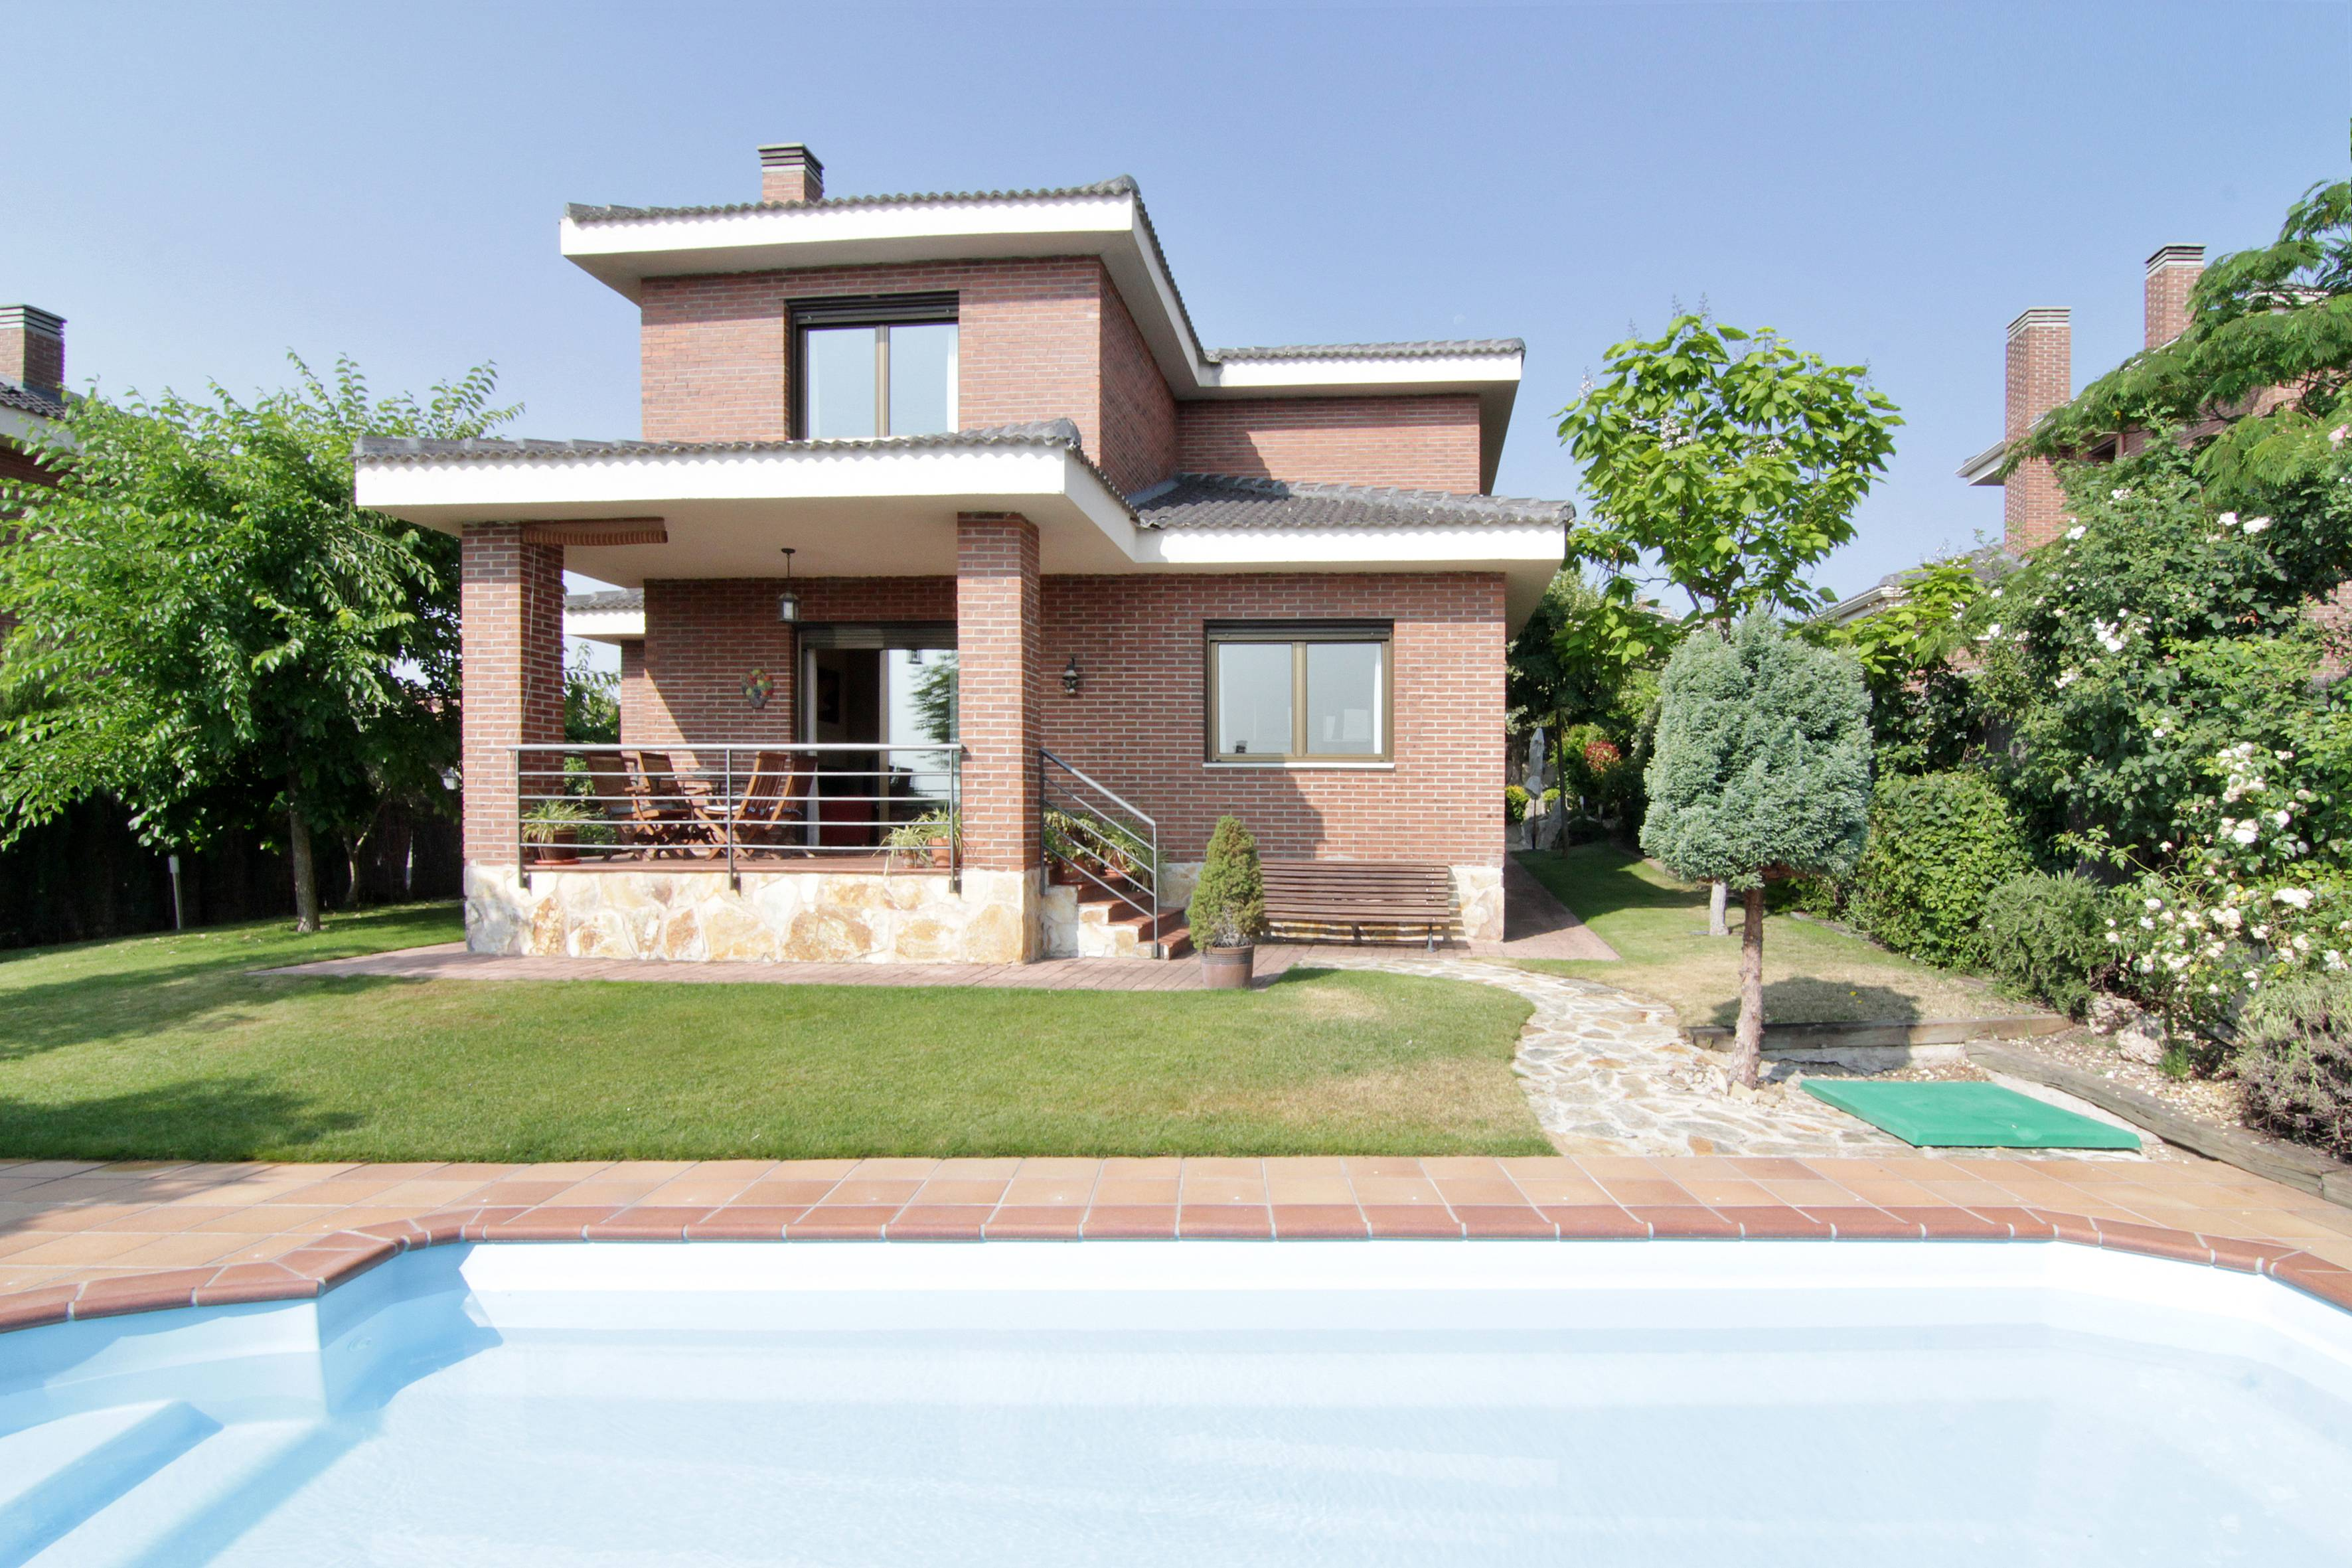 Chalet individual con piscina y jard n guadalix for Alquiler verano sierra madrid piscina